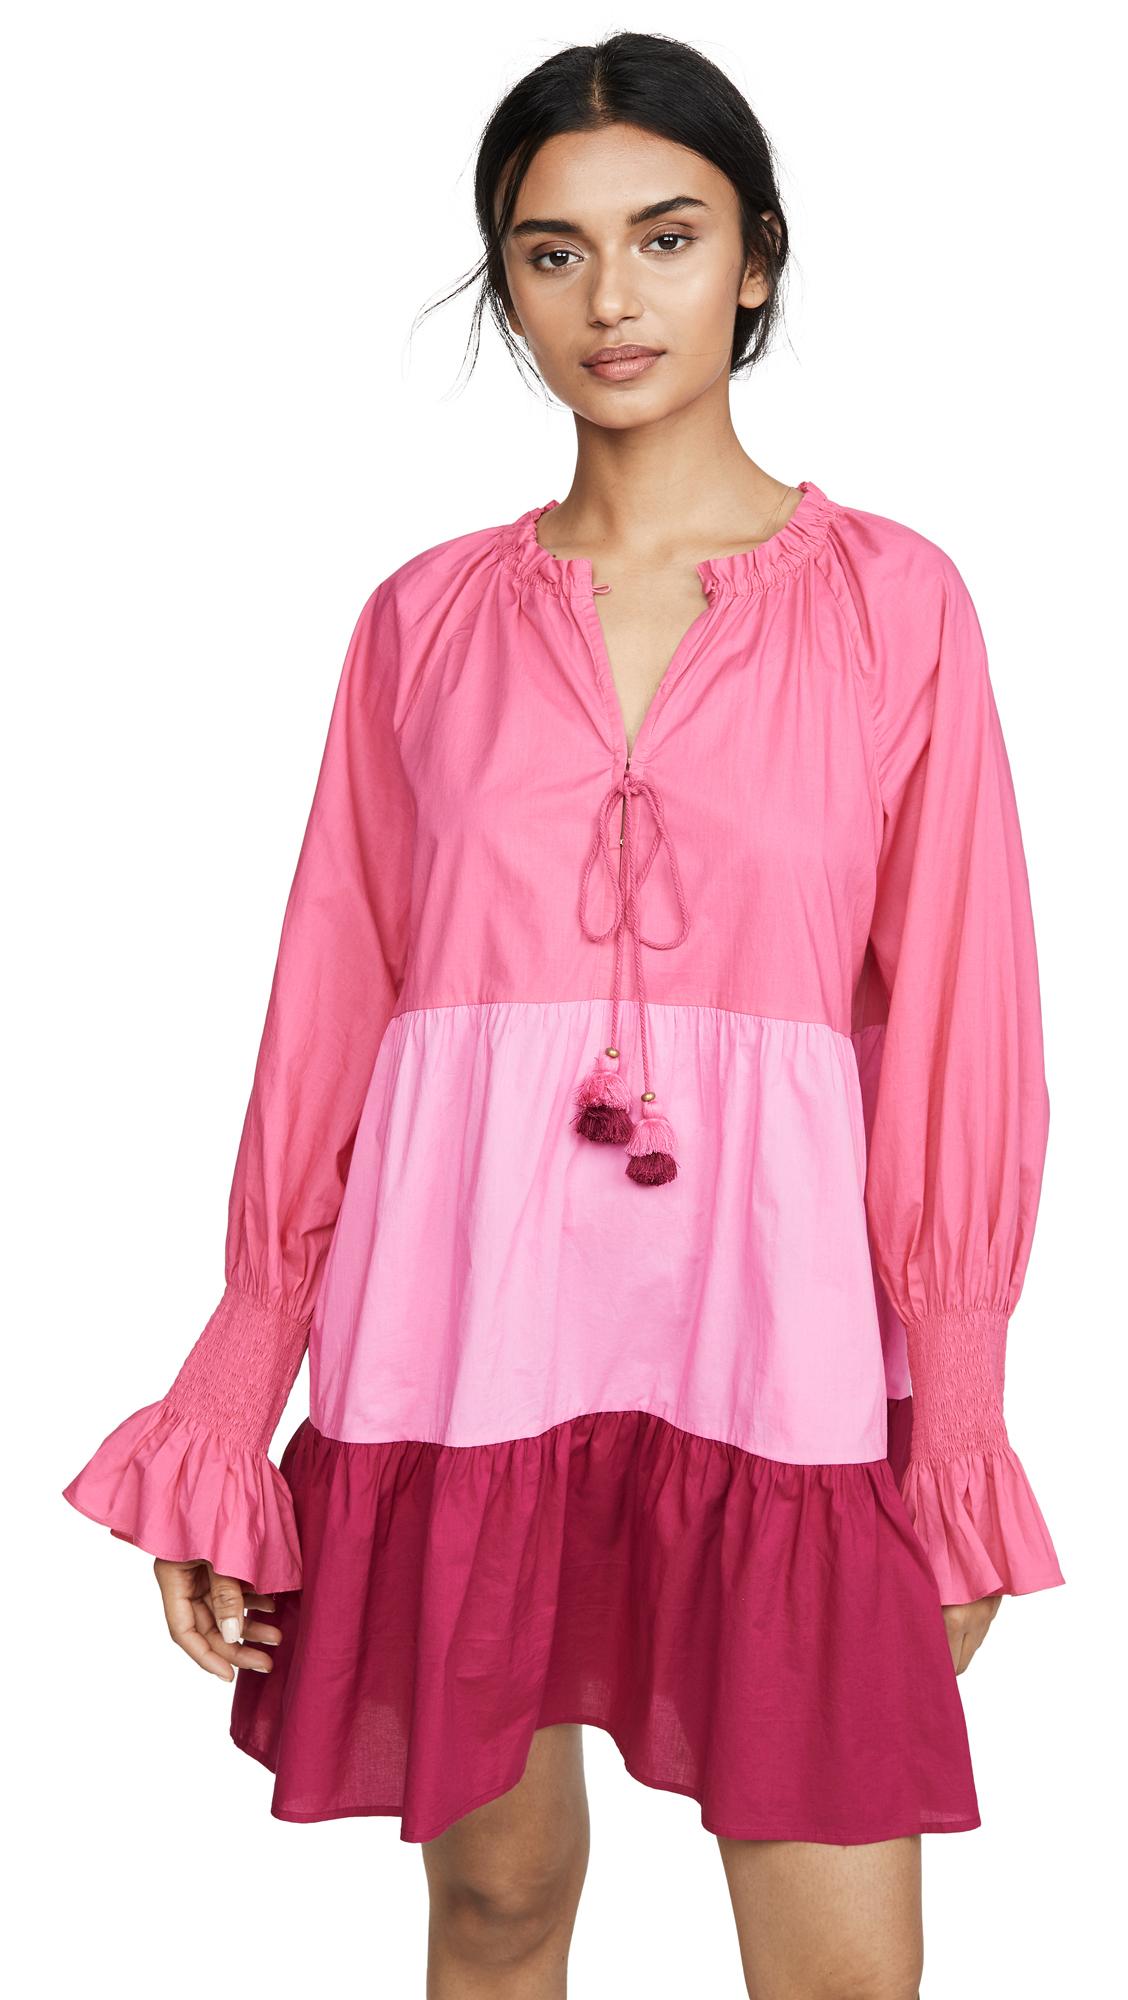 Figue Bella Short Dress - 40% Off Sale